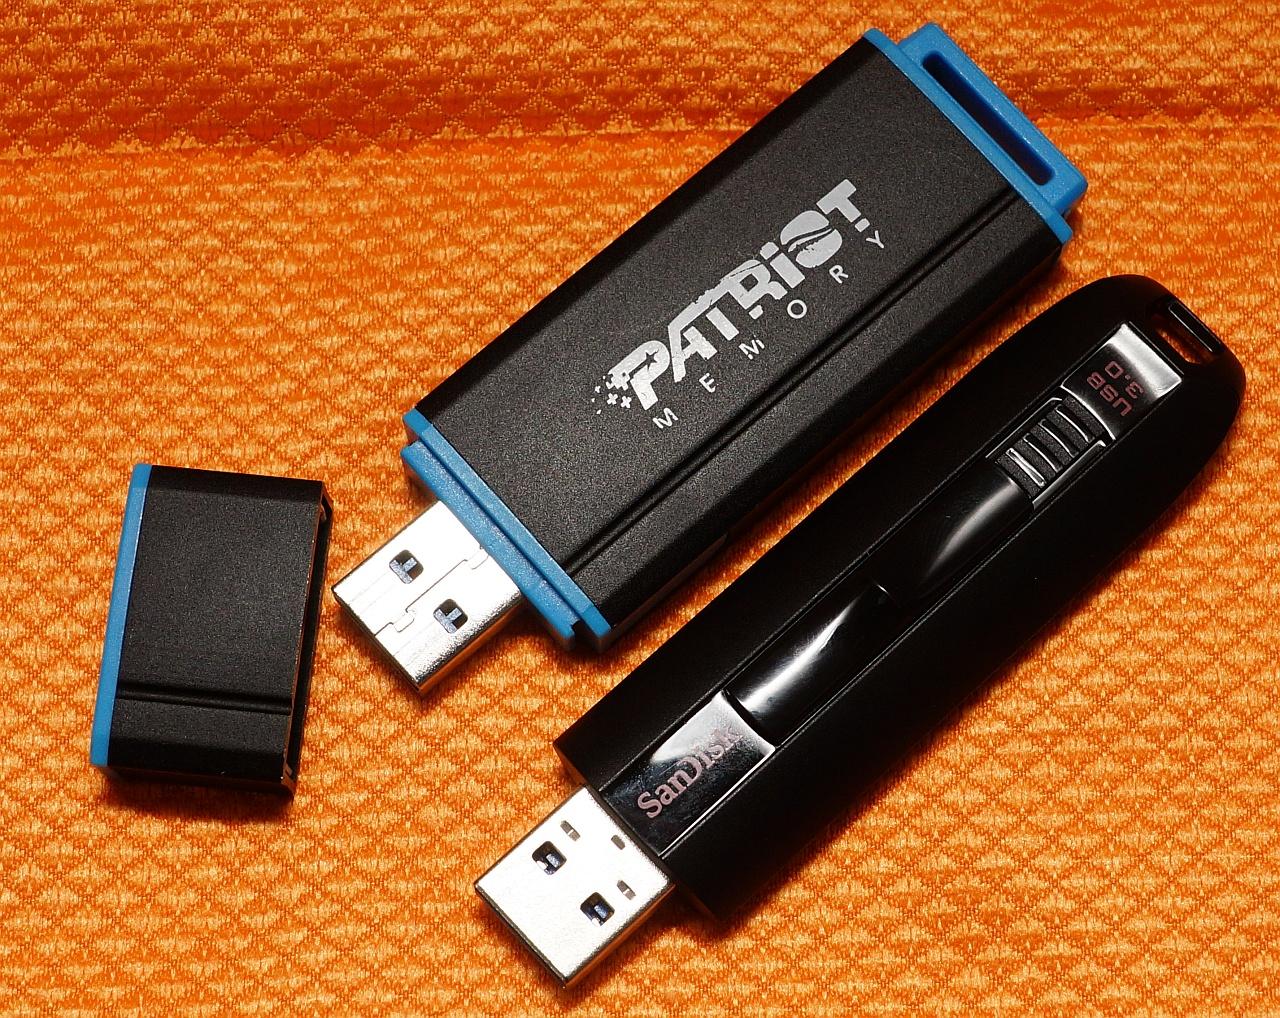 USB 3.0 SanDisk Extreme 64GB